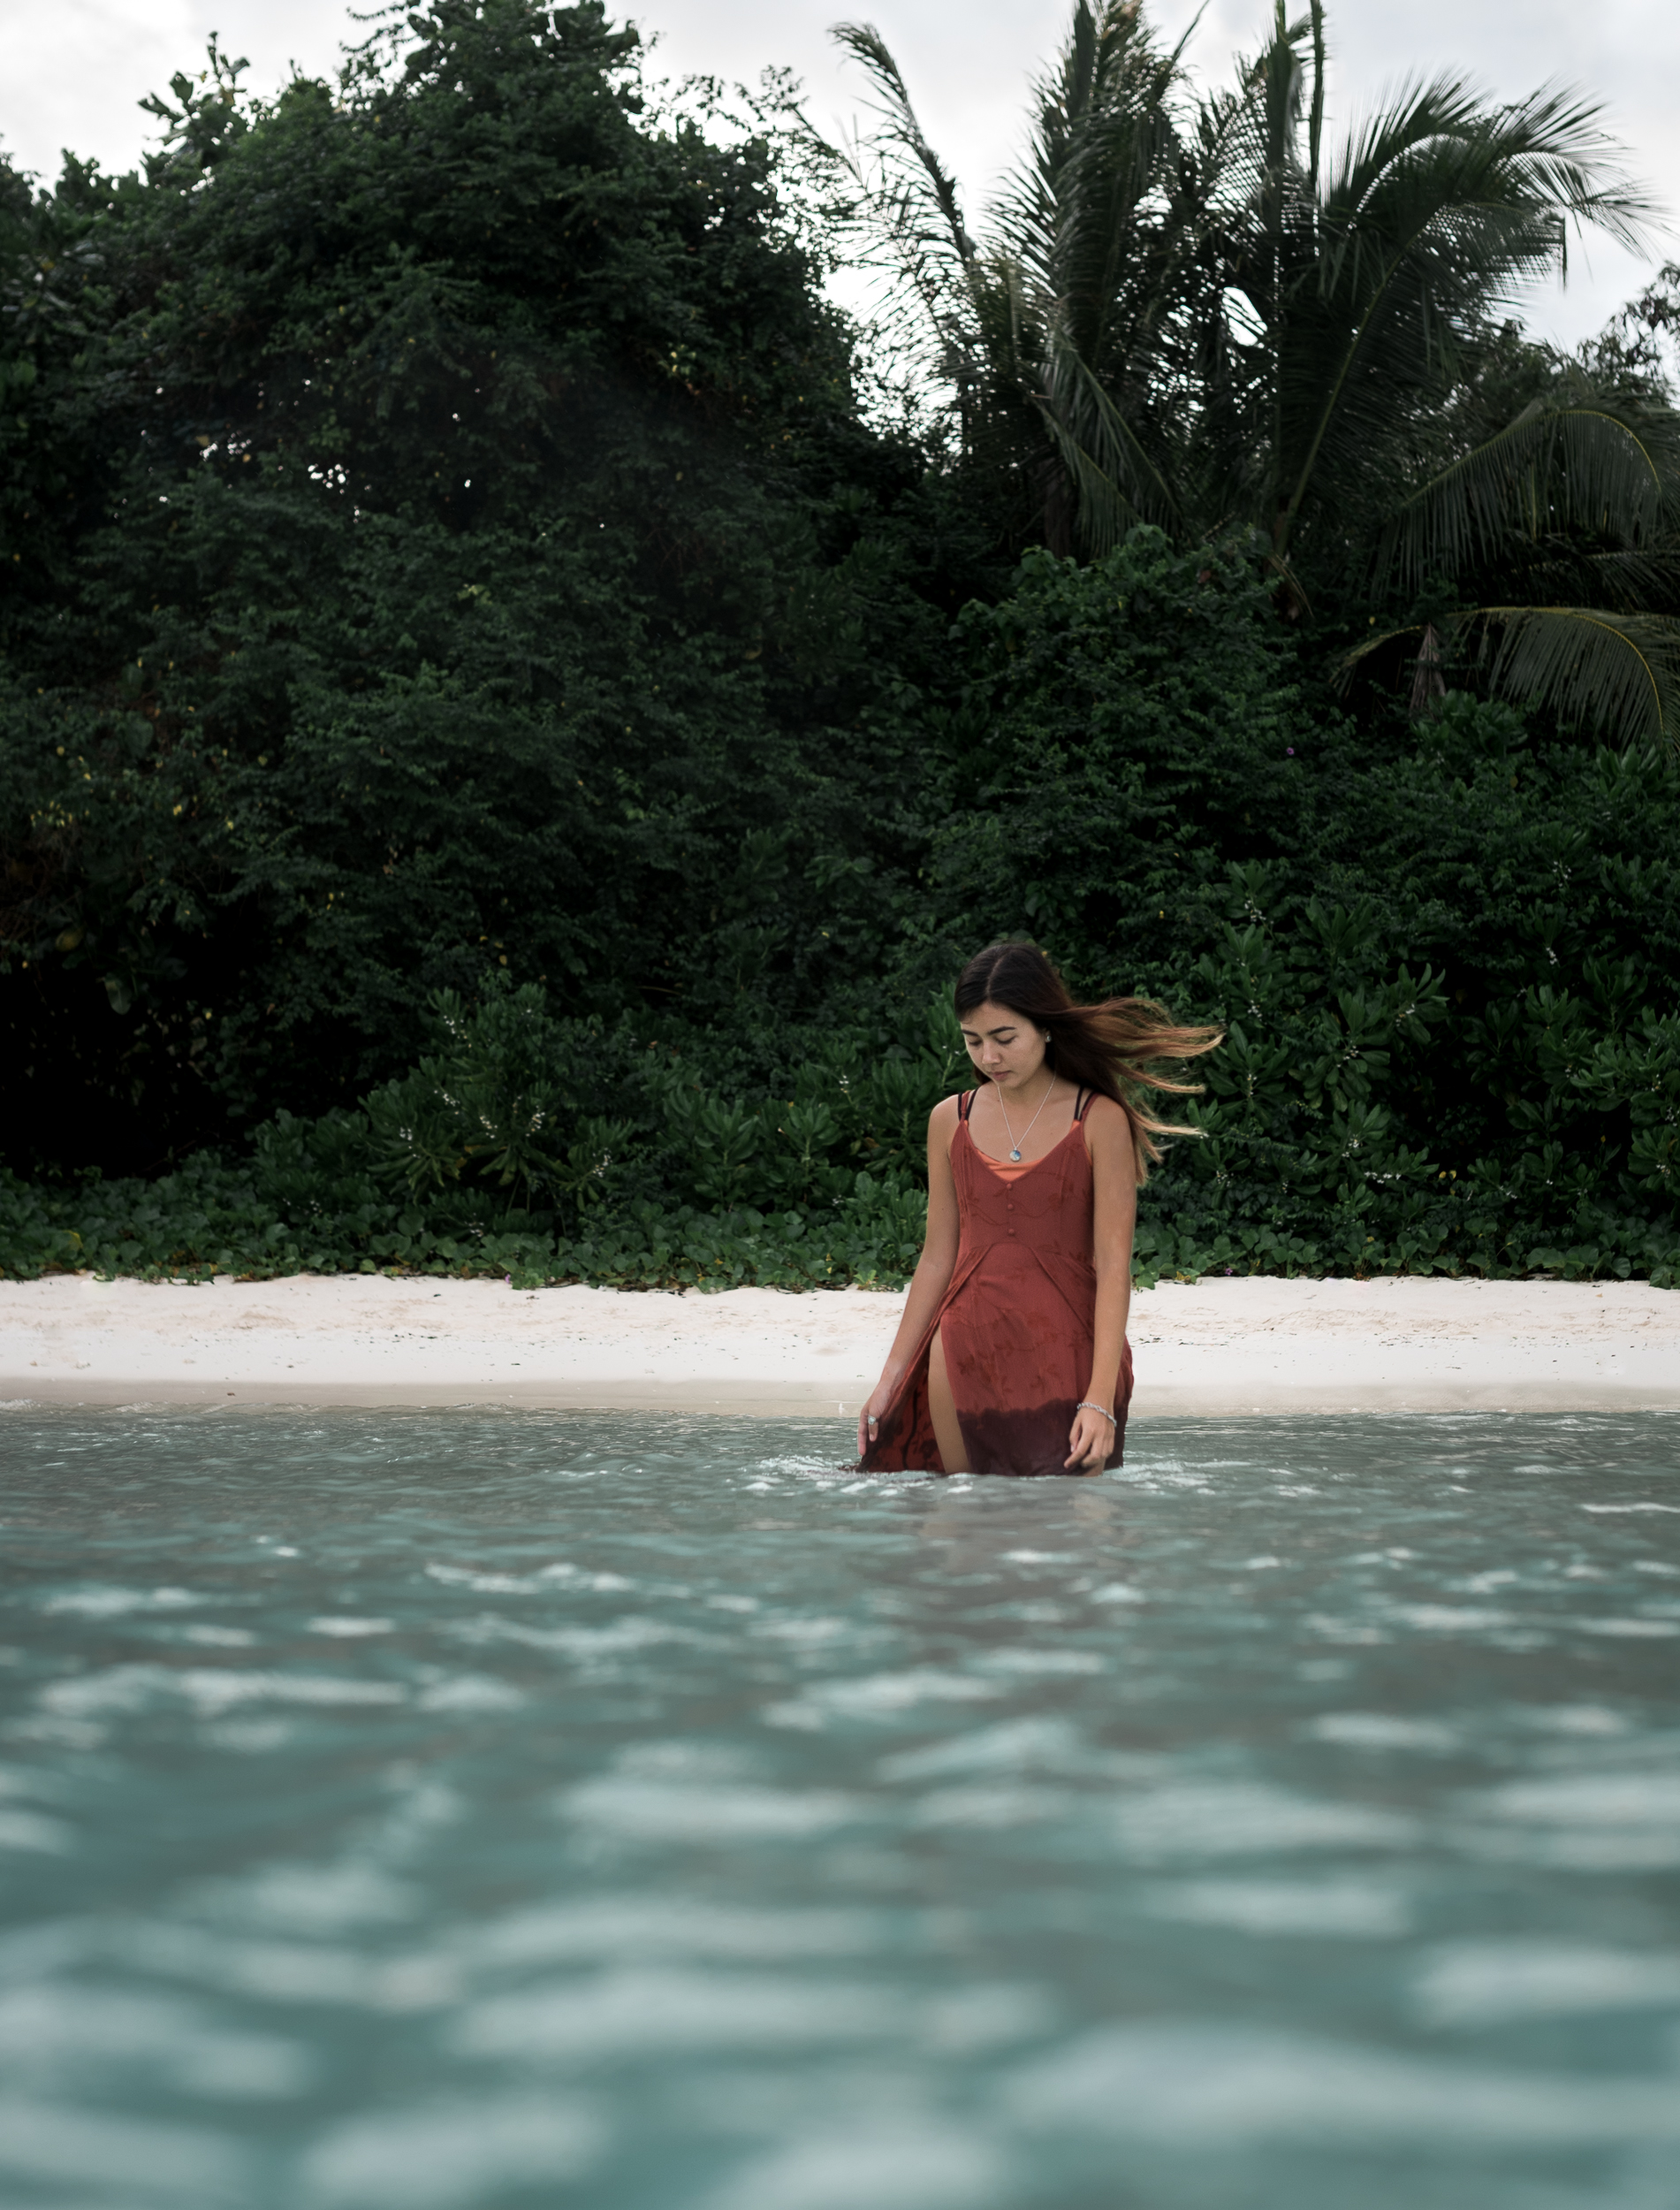 woman-model-branding-photography-tumon-guam-roxanne-augusta-4.jpg